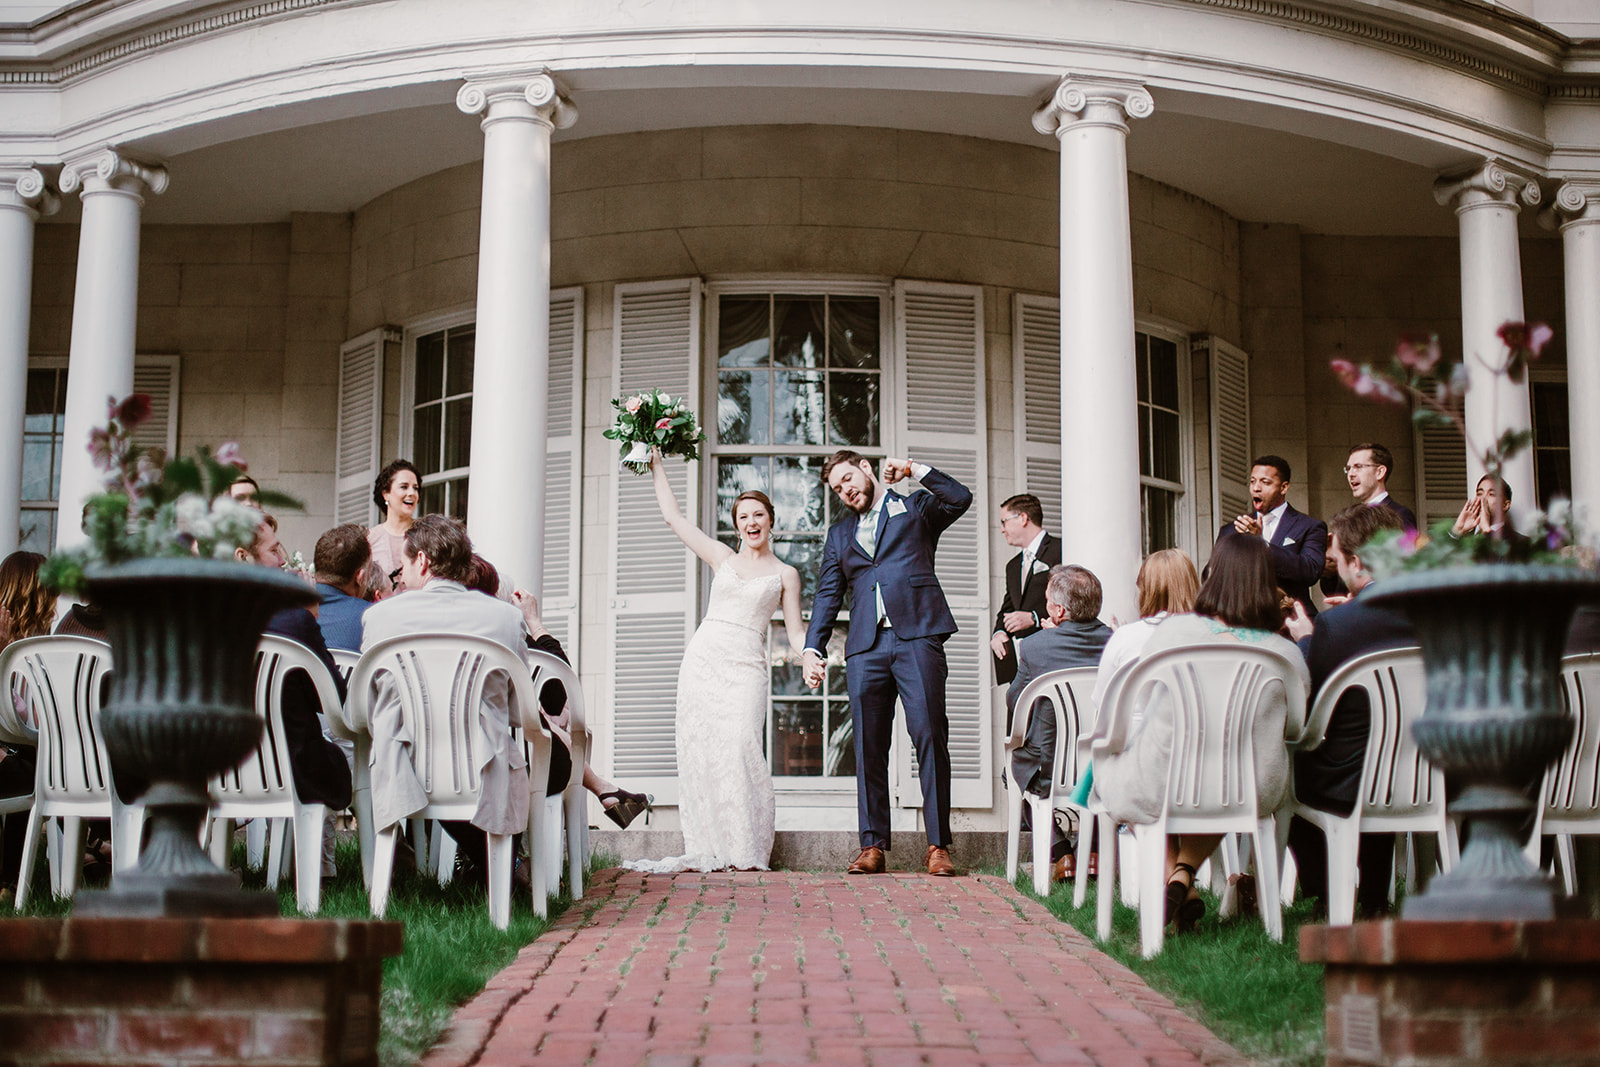 SarahMattozziPhotography-MaggieJustin-Ceremony-167.jpg